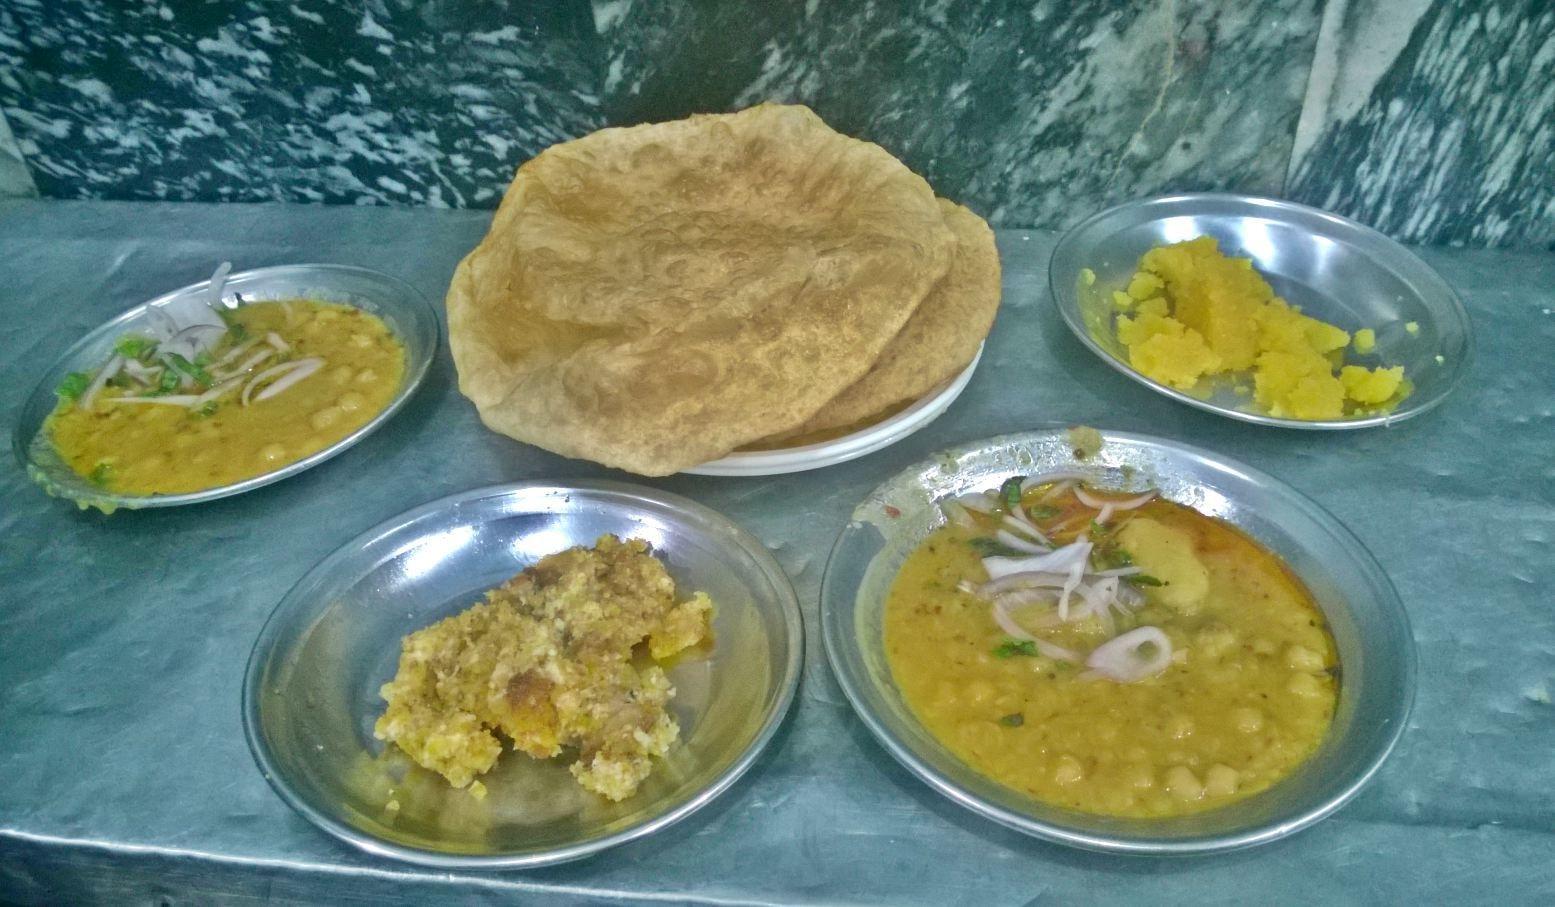 The halwa puri meal at Taj Mahal Sweets